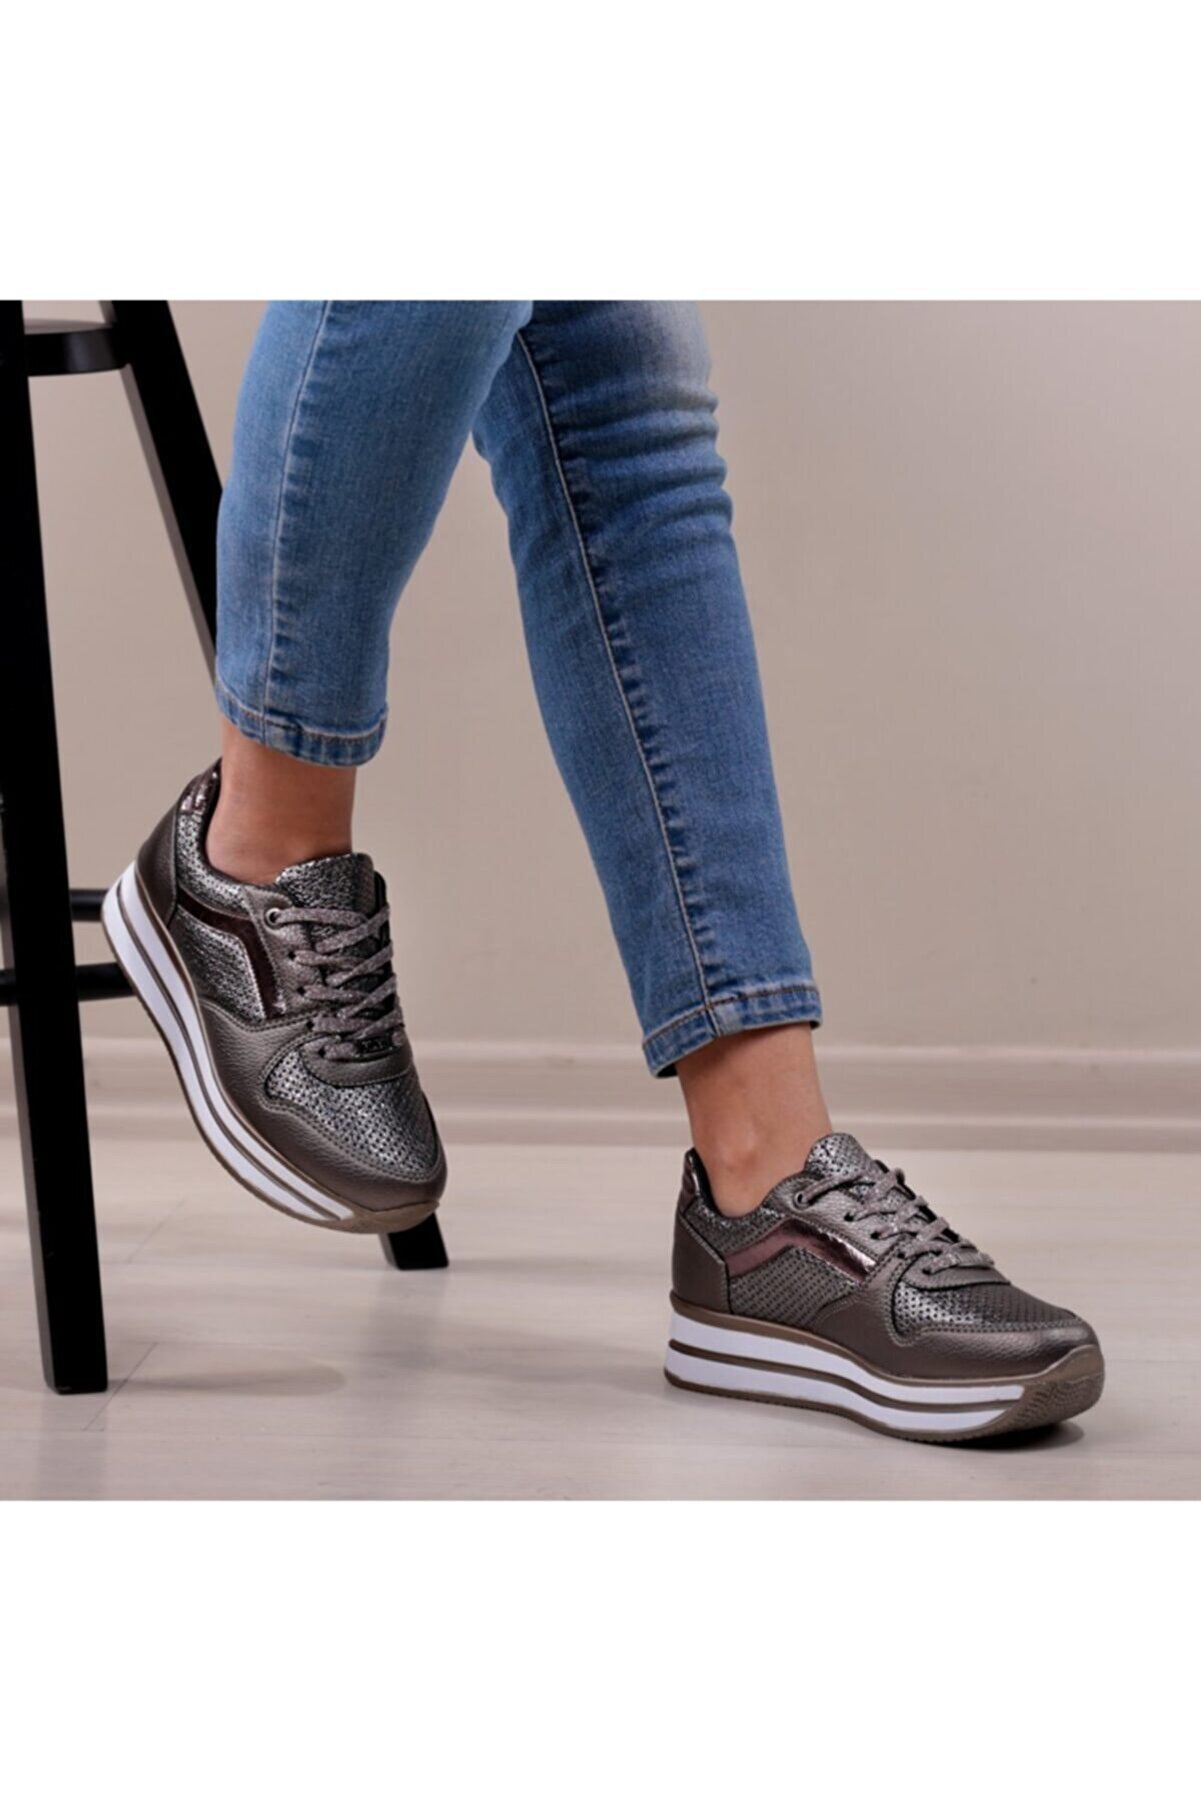 pabucmarketi Comfort Platin Bayan Spor Ayakkabı